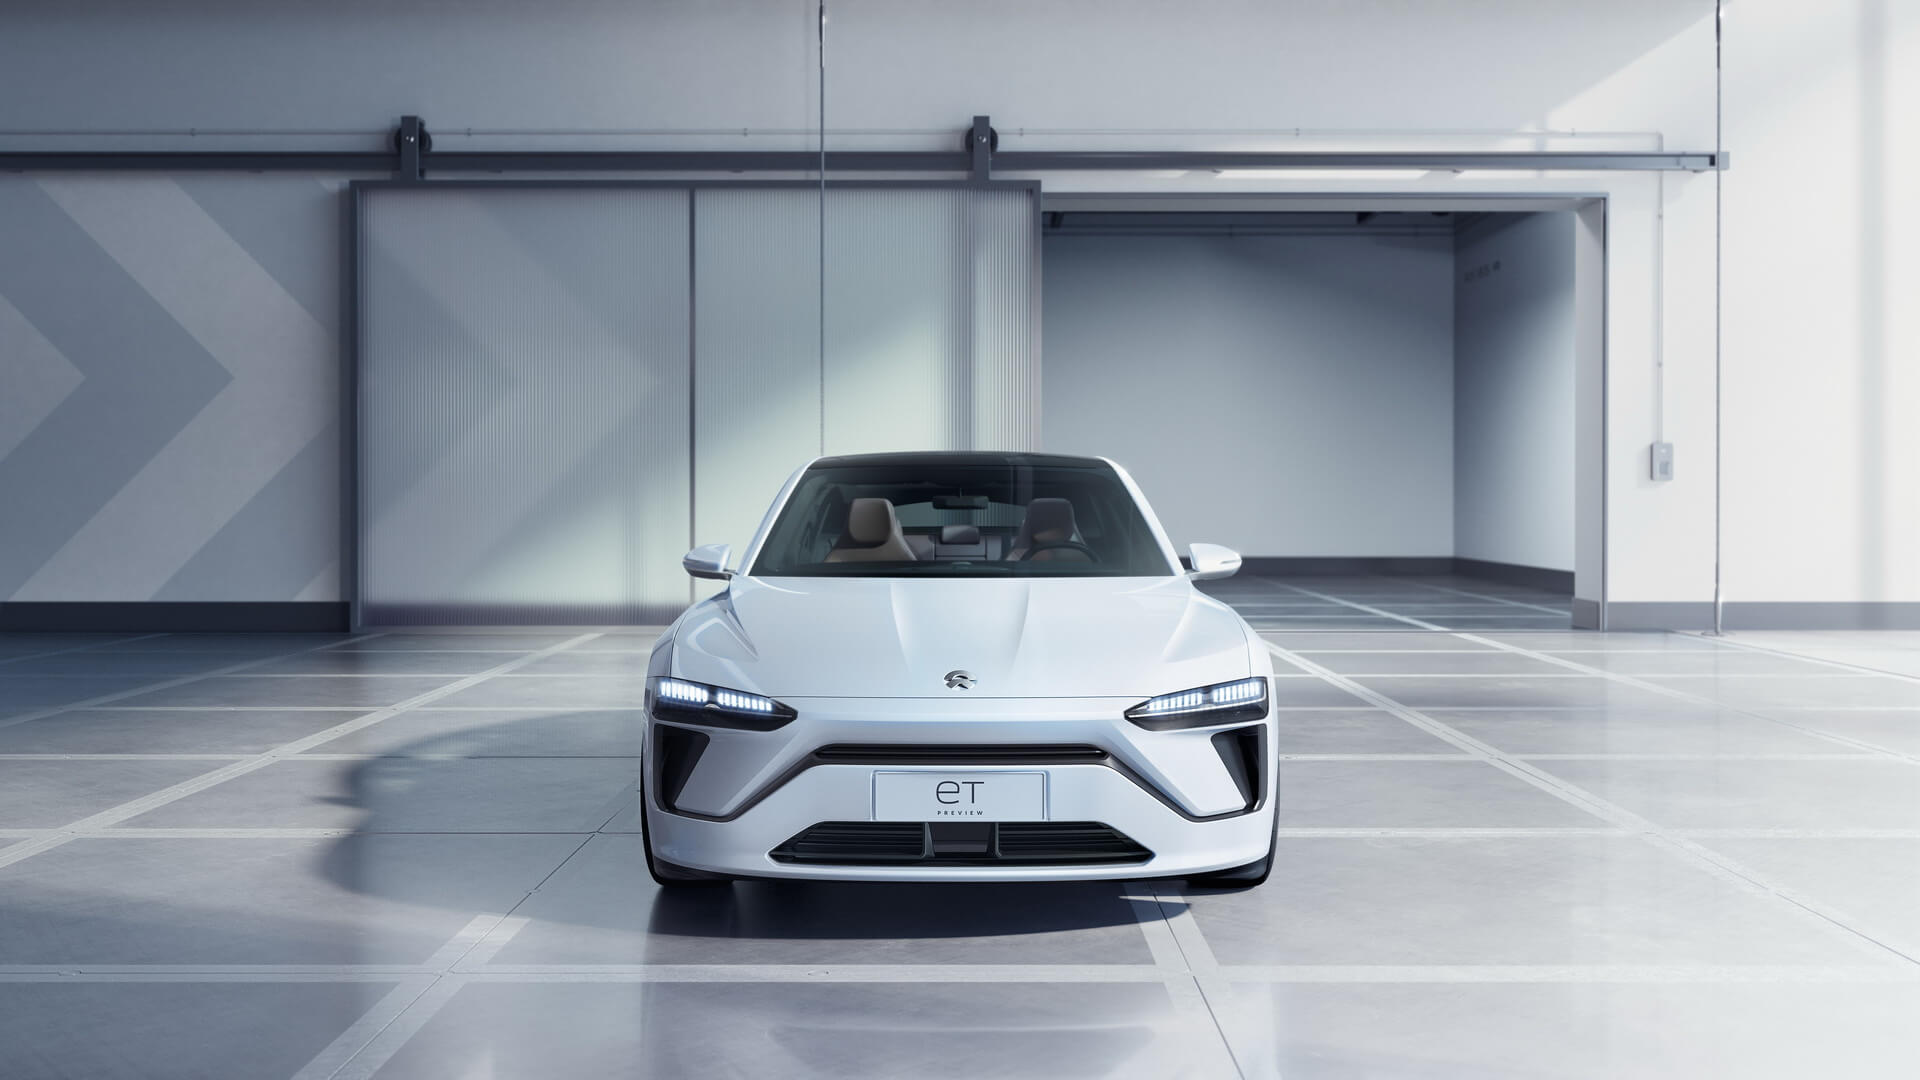 NIO представила новый электрический седан ET Preview